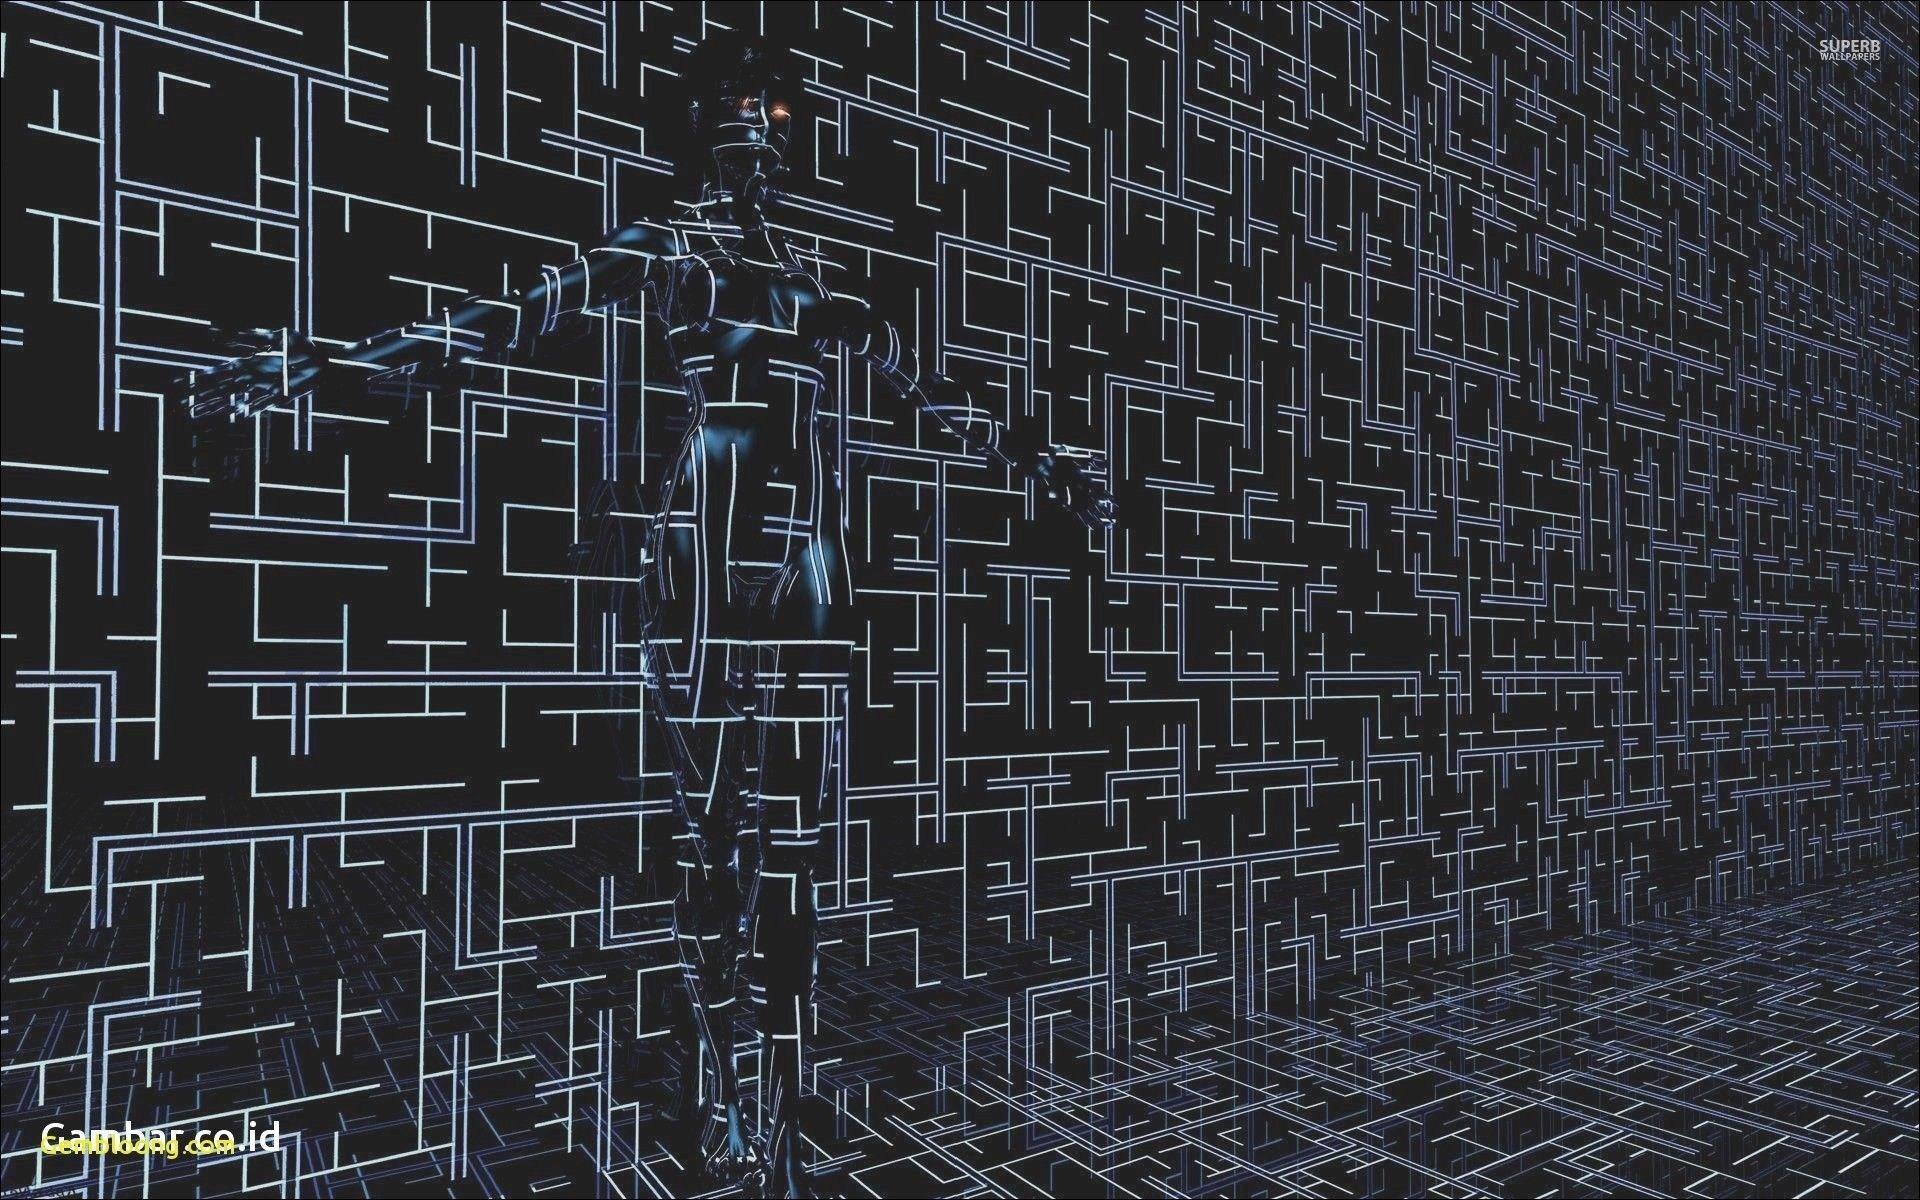 4K Resolution Wallpaper 64 images